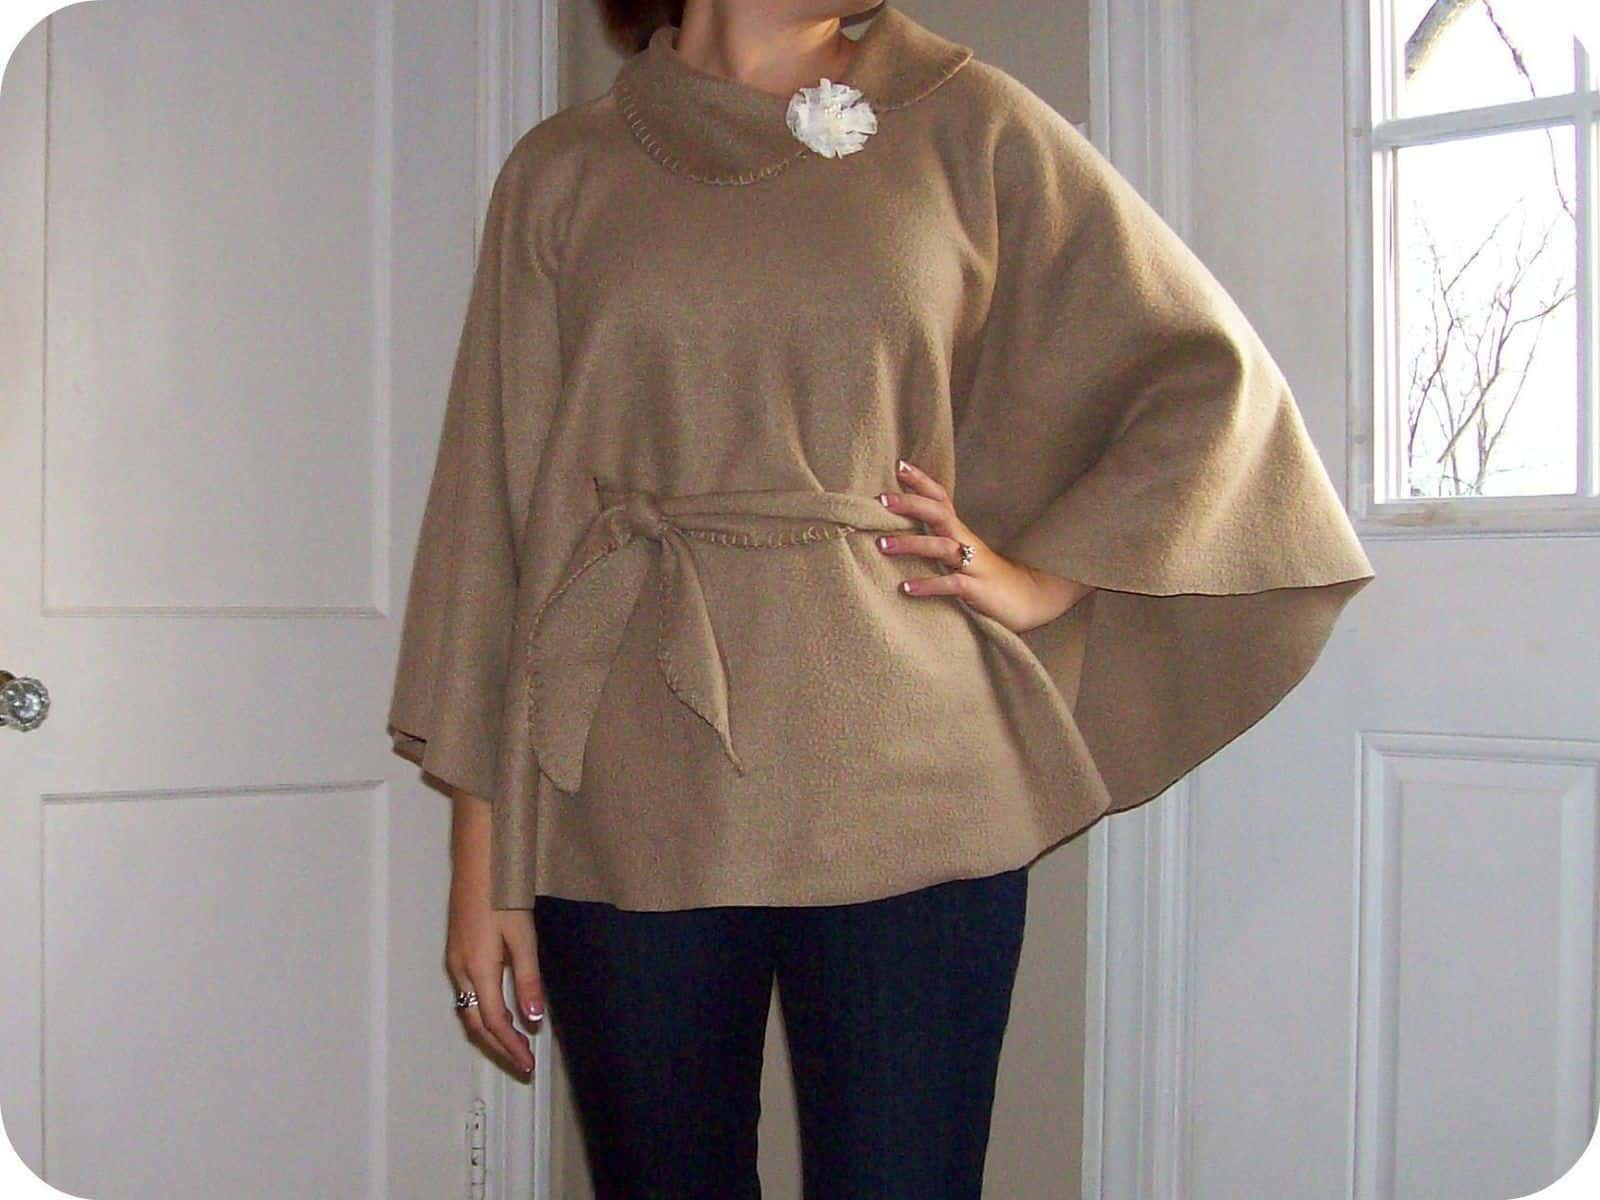 DIY no-sew fleece poncho and waist tie